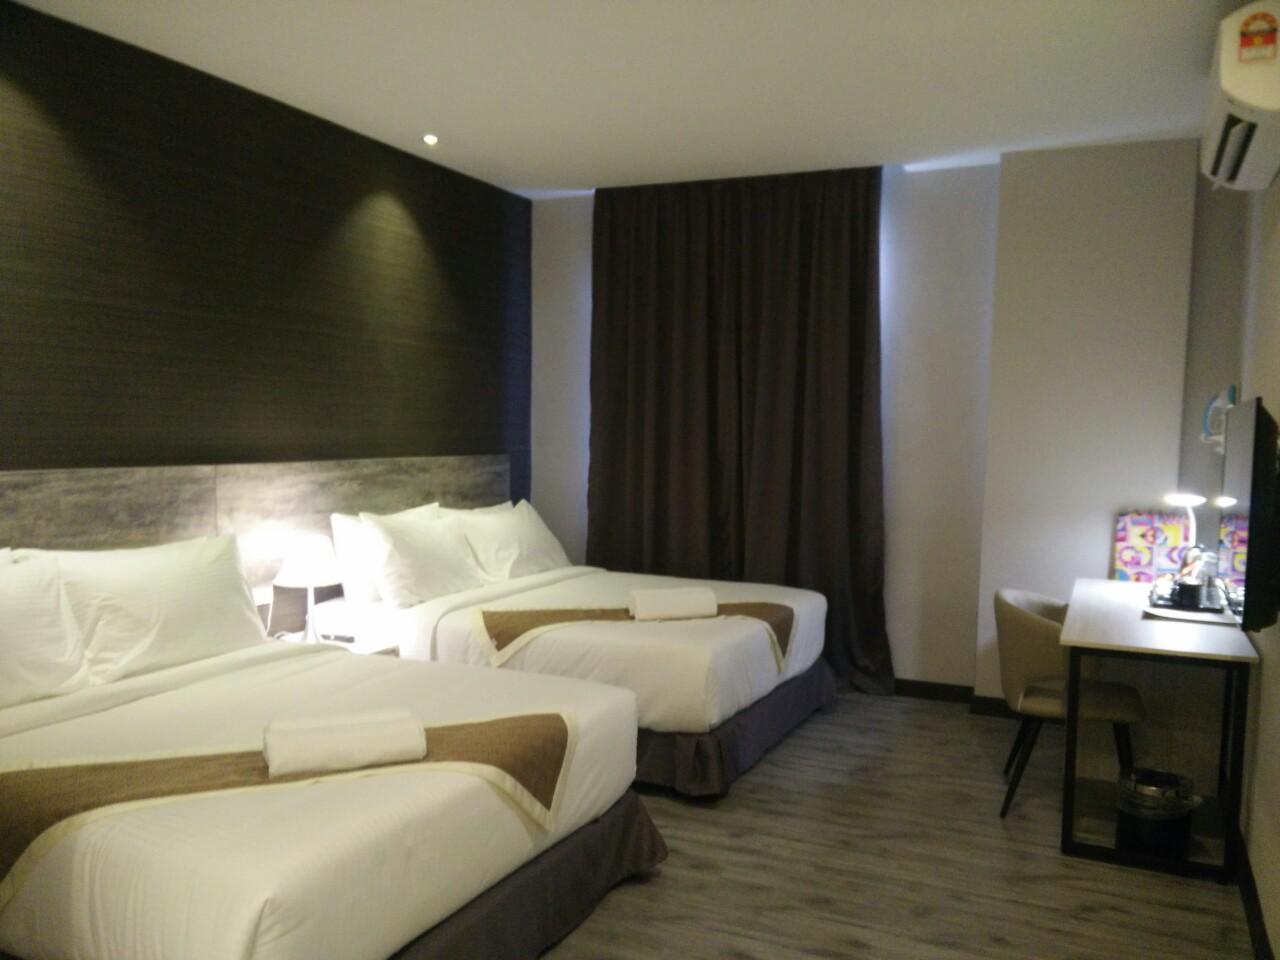 The Leverage Business Hotel Skudai, Johor Bahru